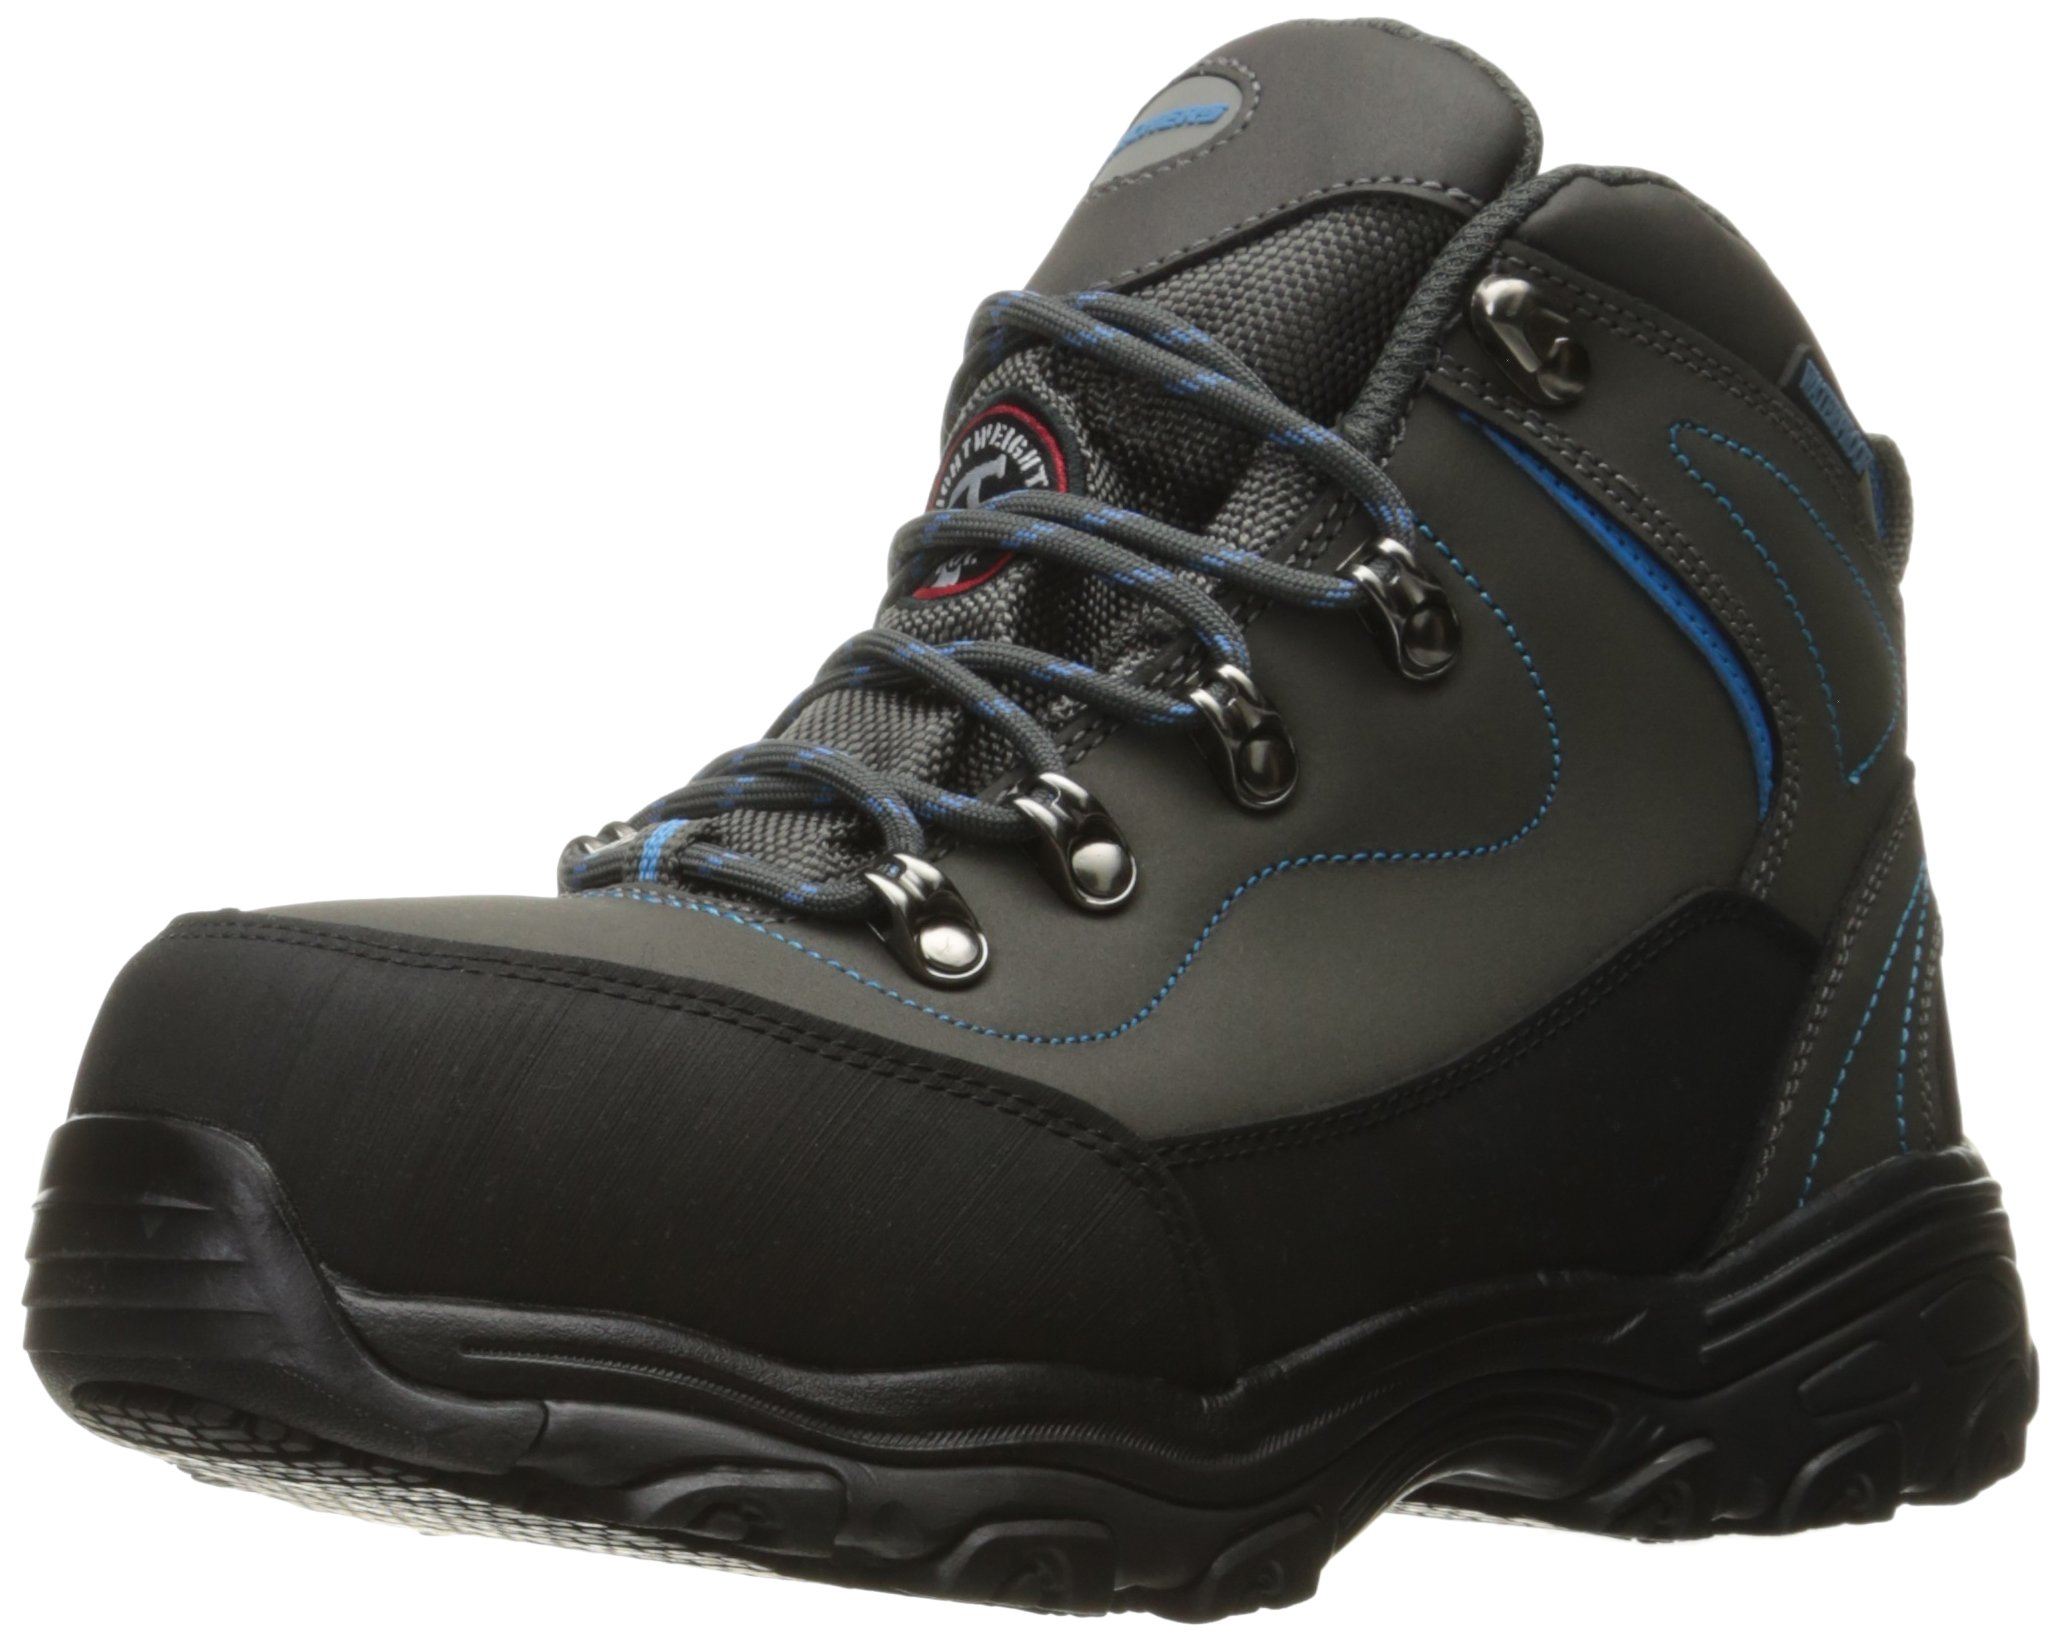 Skechers Women's D Lite Amasa Work Boot,Gray Blue,8 M US